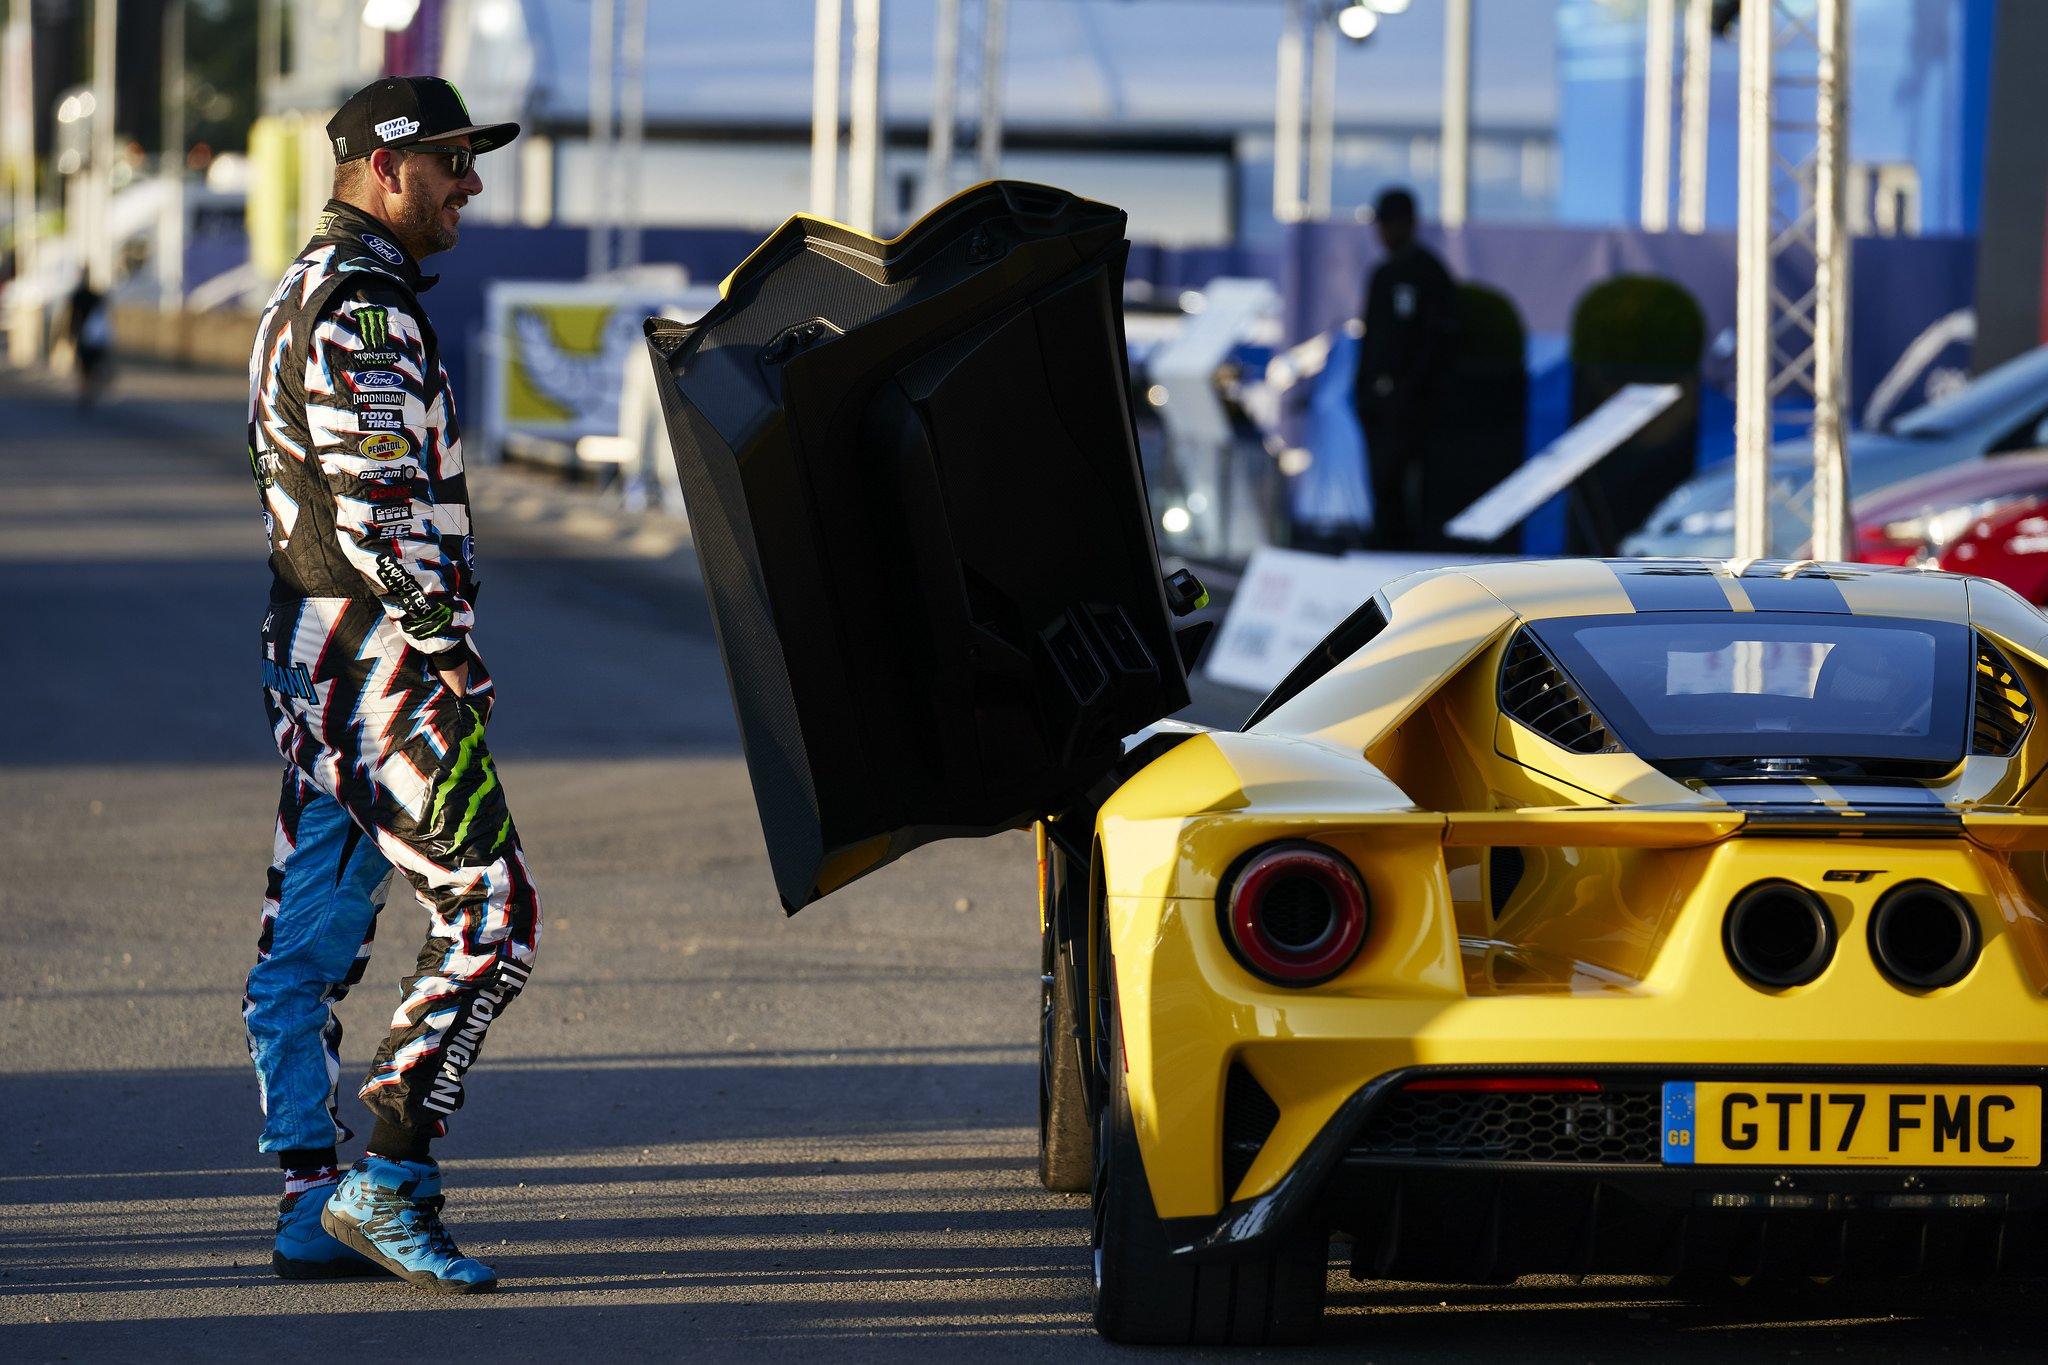 Ford Model B >> Ken Block Drives the GT at Le Mans - AllFordMustangs